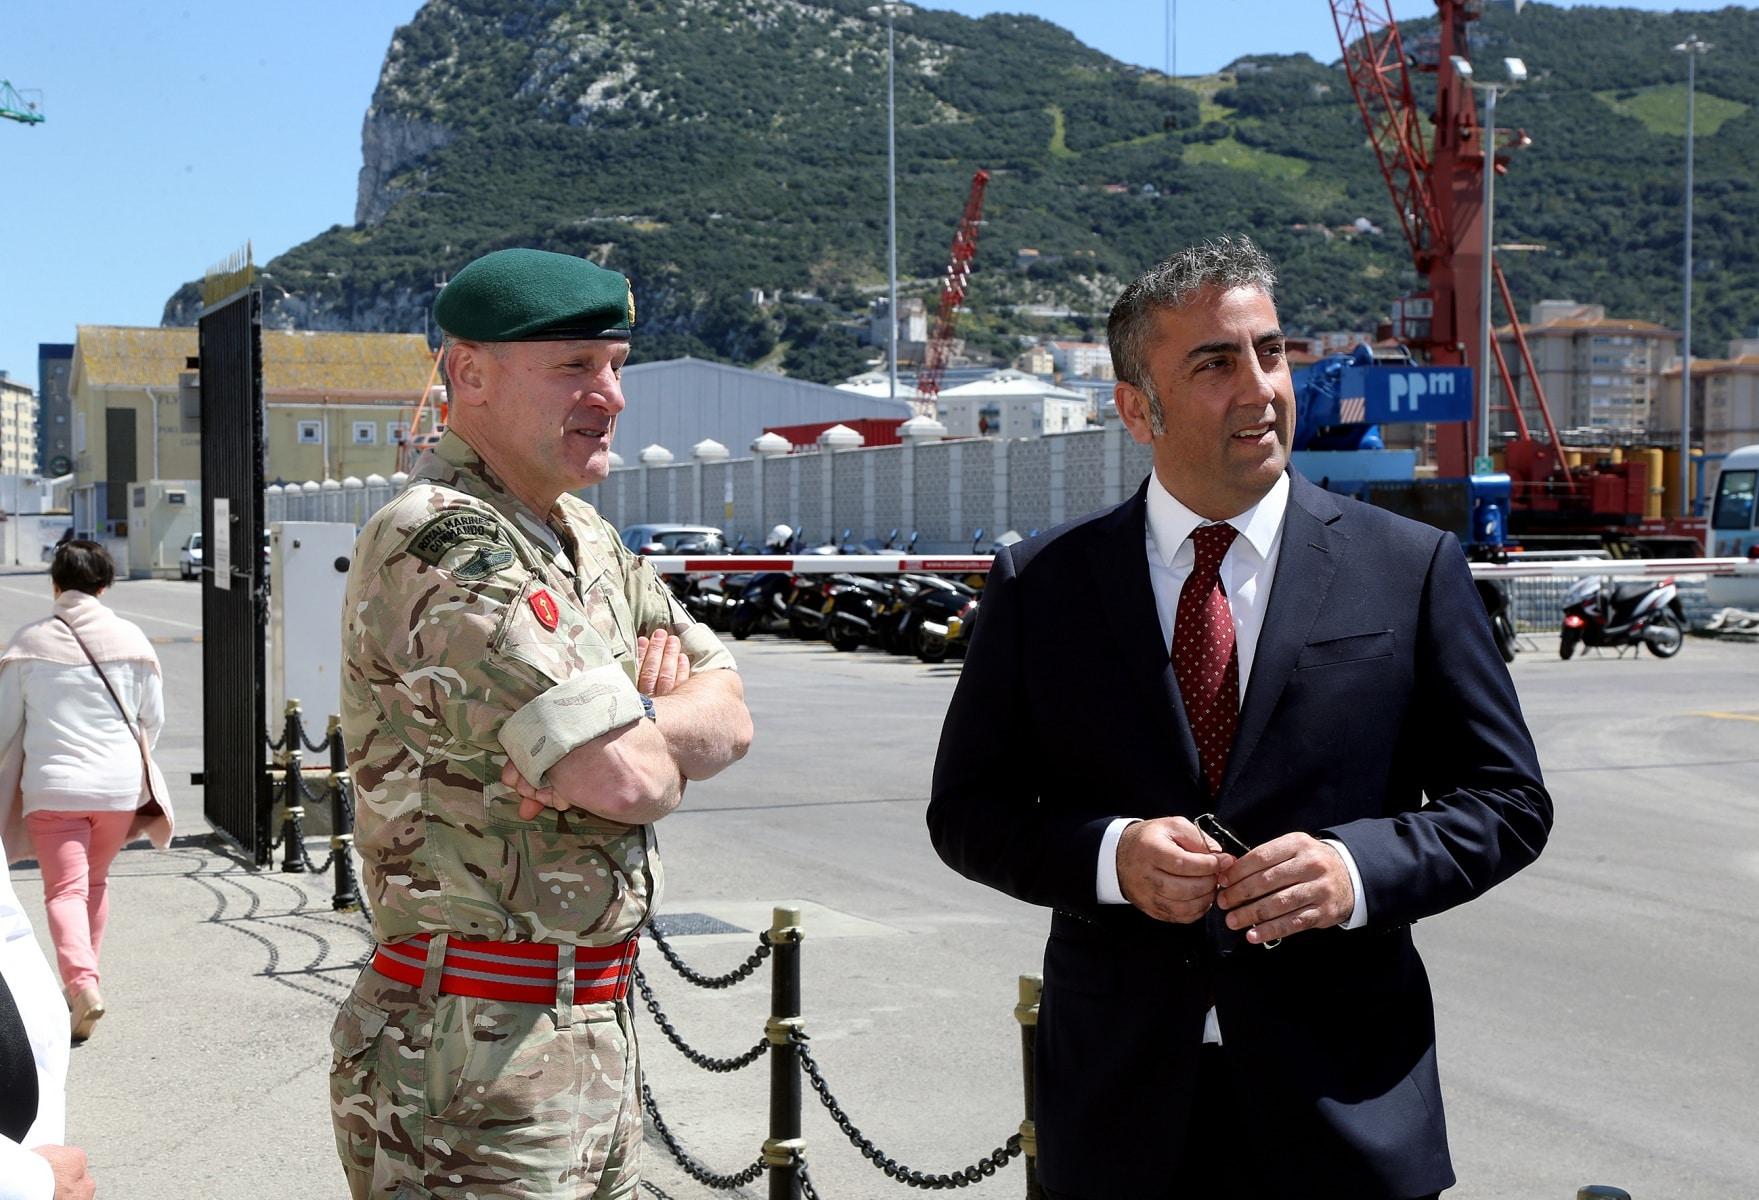 visita-oficial-del-gobernador-al-puerto-de-gibraltar_25551864273_o